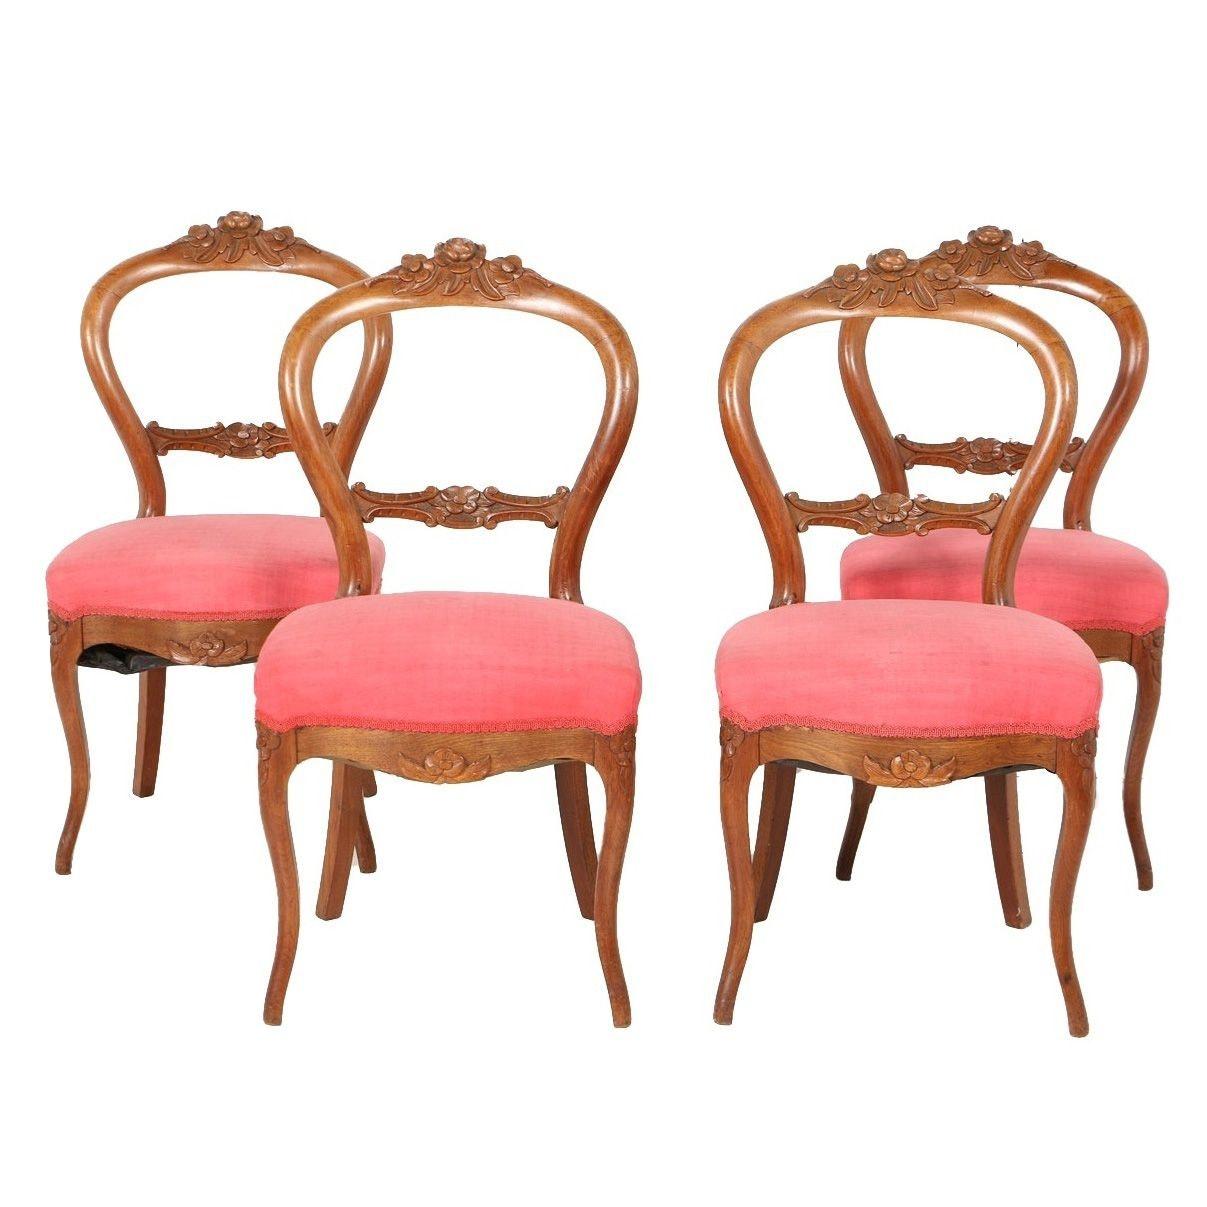 Antique Victorian Rococo Revival Walnut Side Chairs, Circa 1850-1875